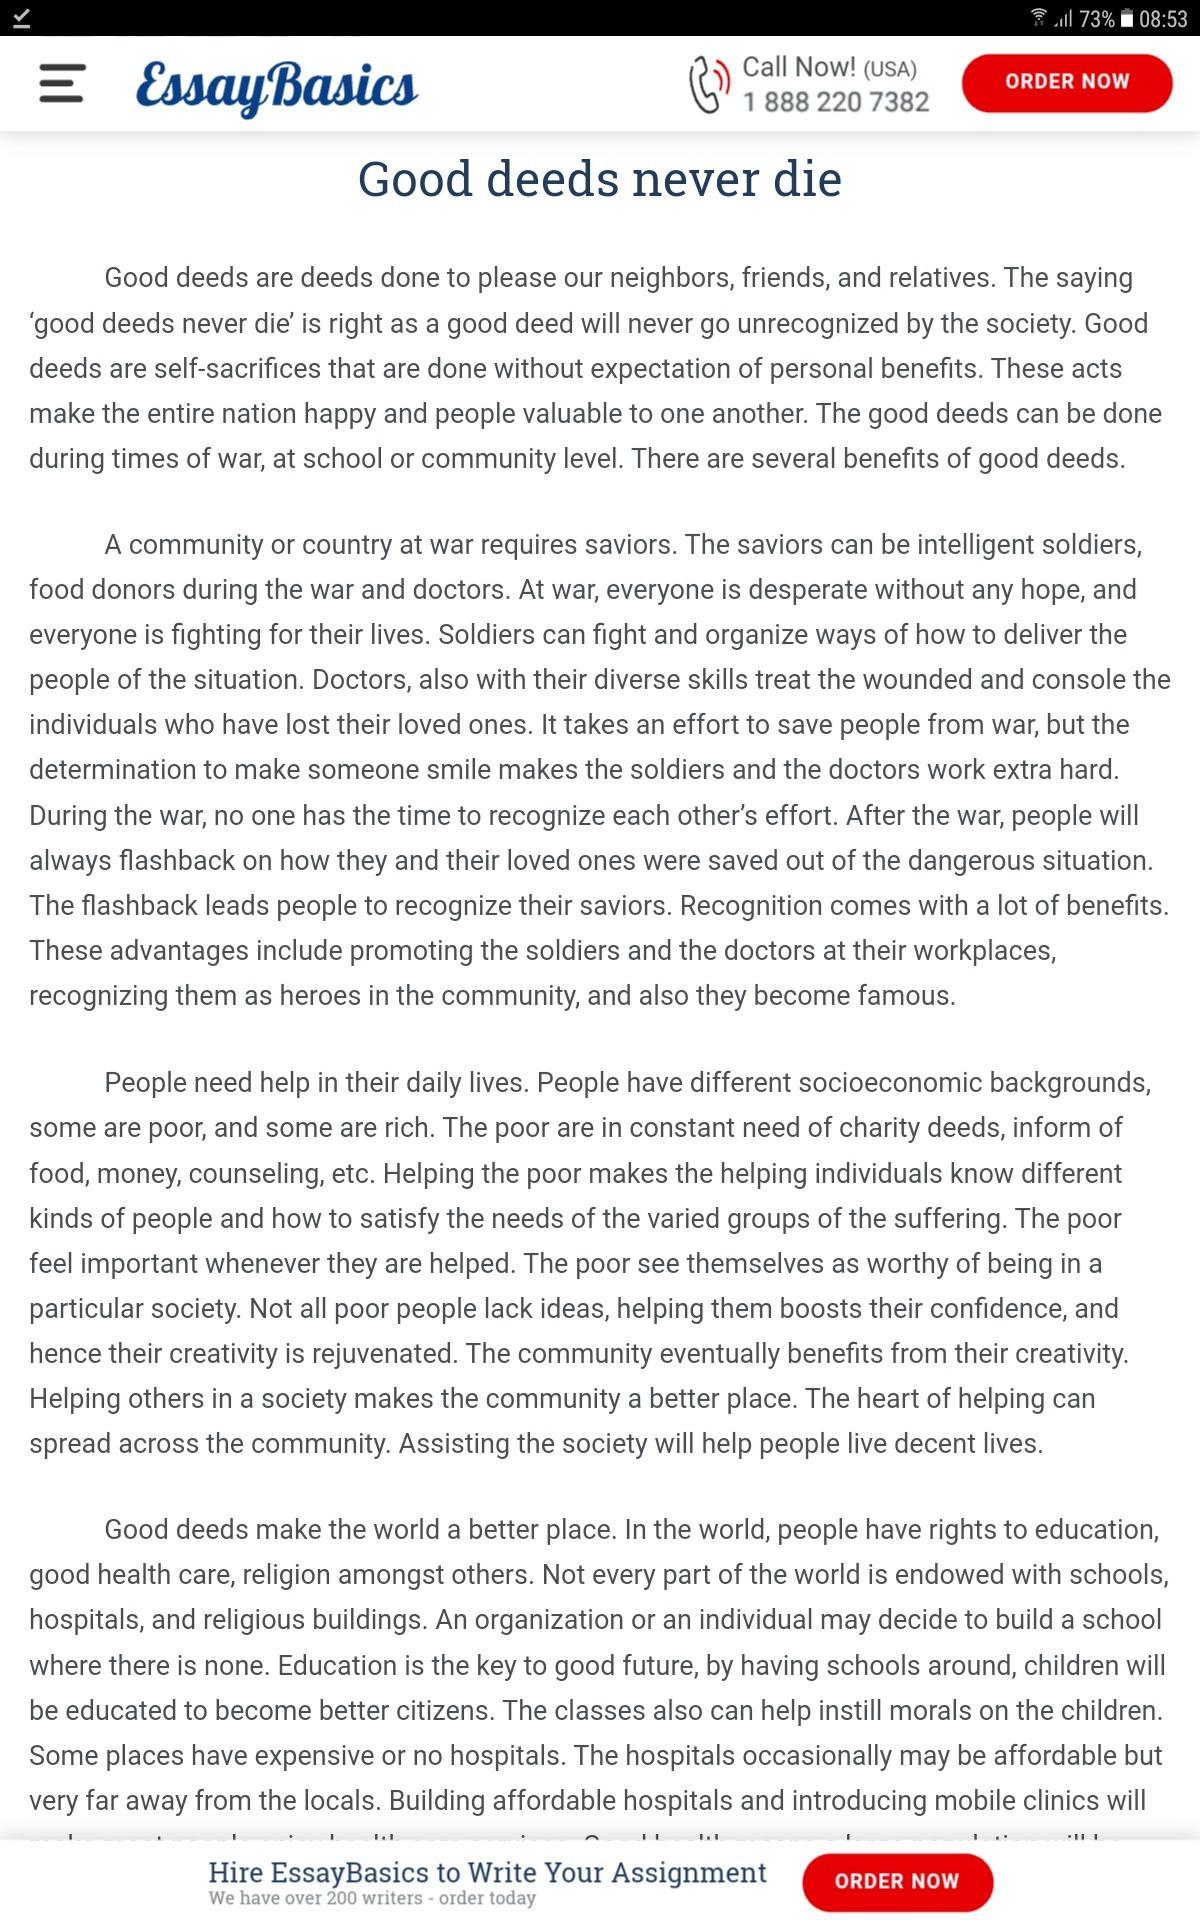 essay on good deeds never die